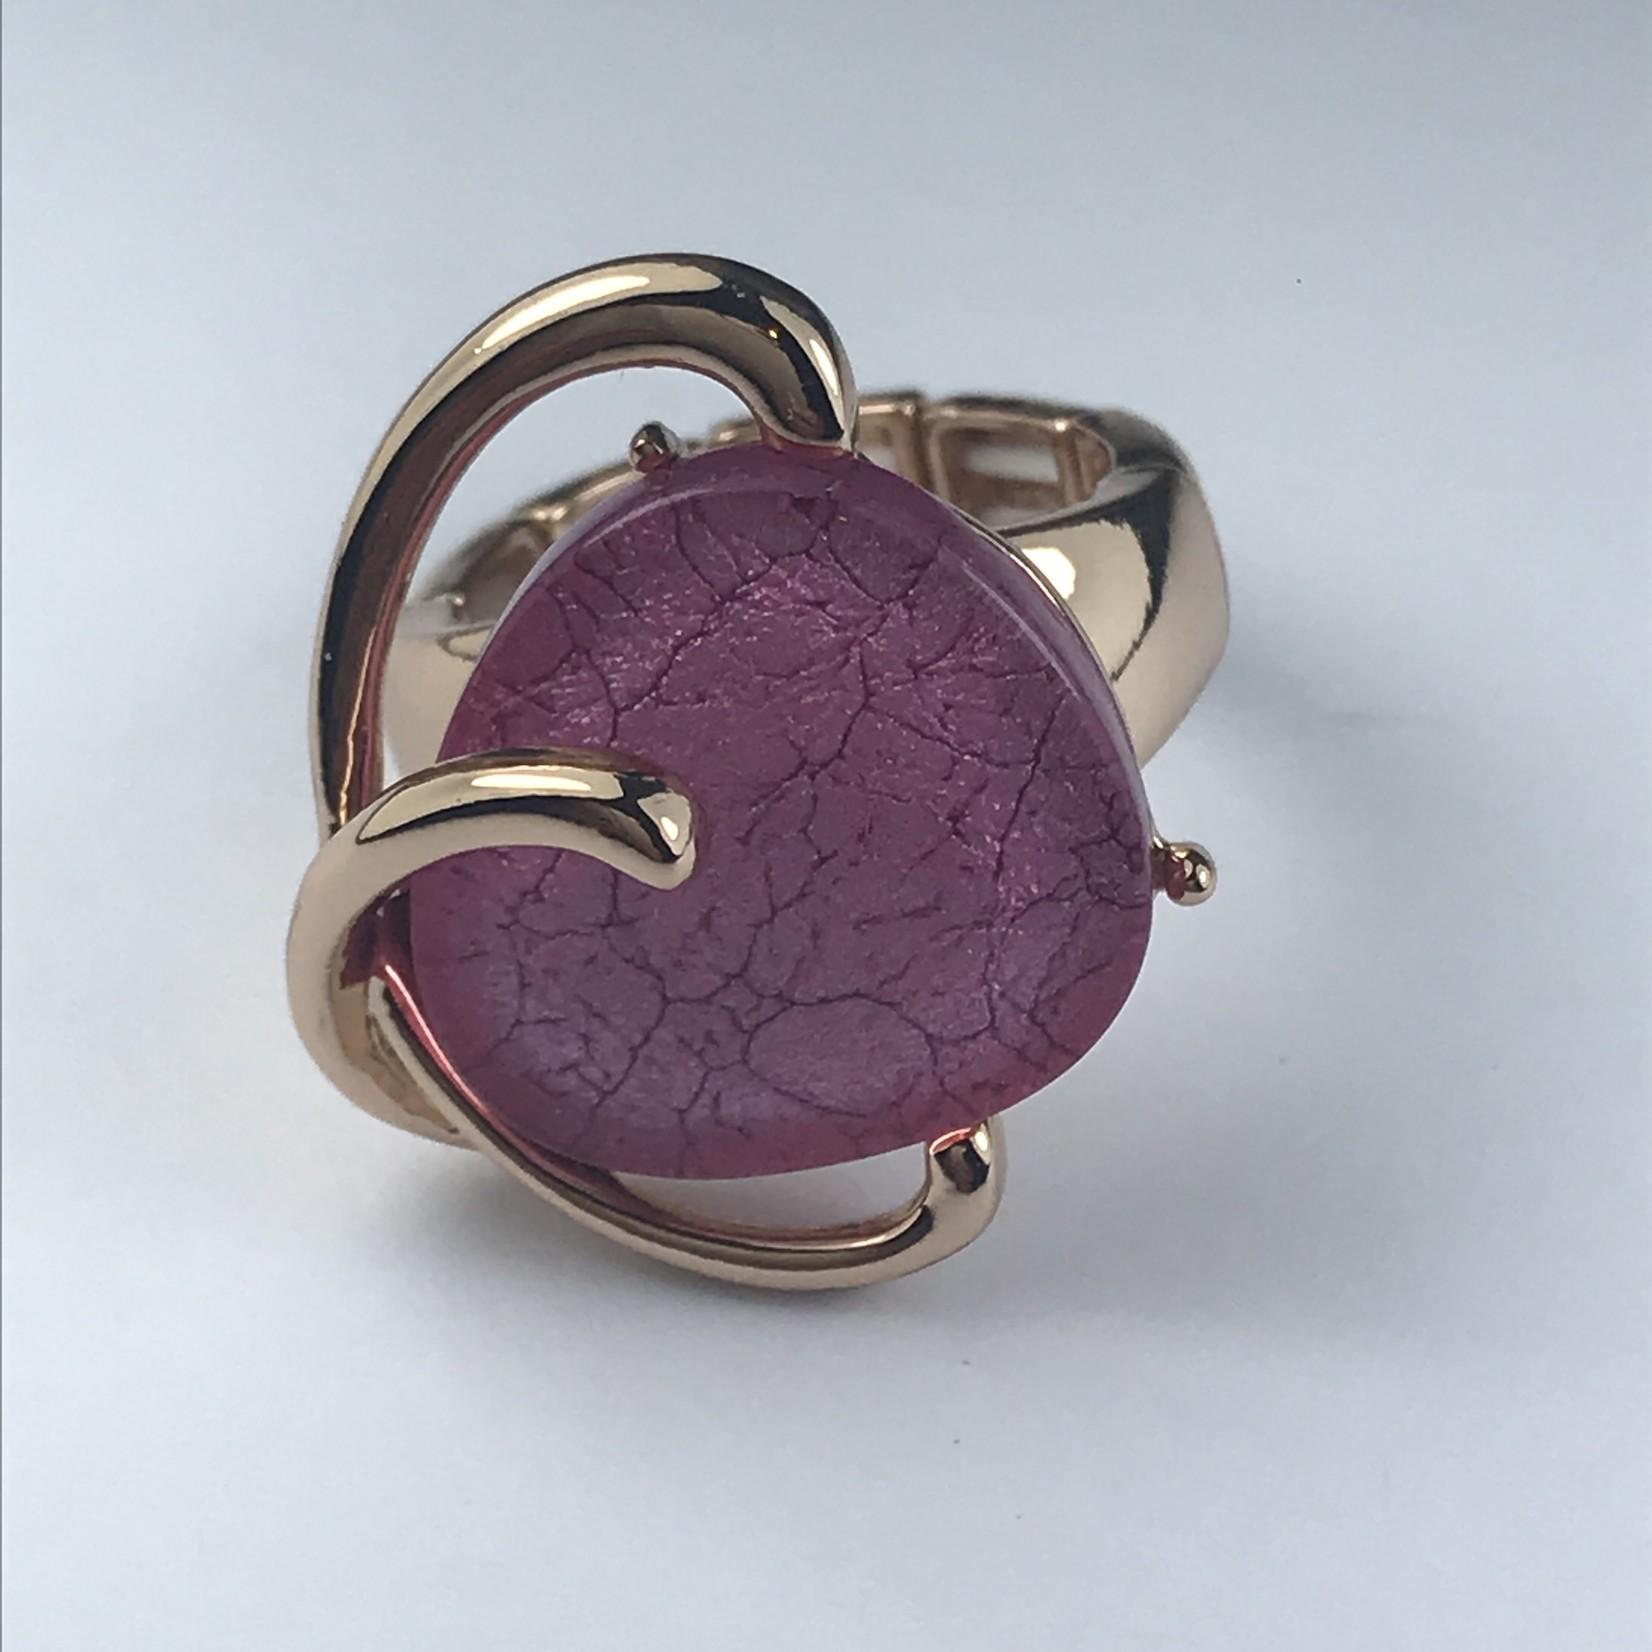 Axxes-Soir Ring - 1 maat - verstelbaar- rosékleurig met roze cateye